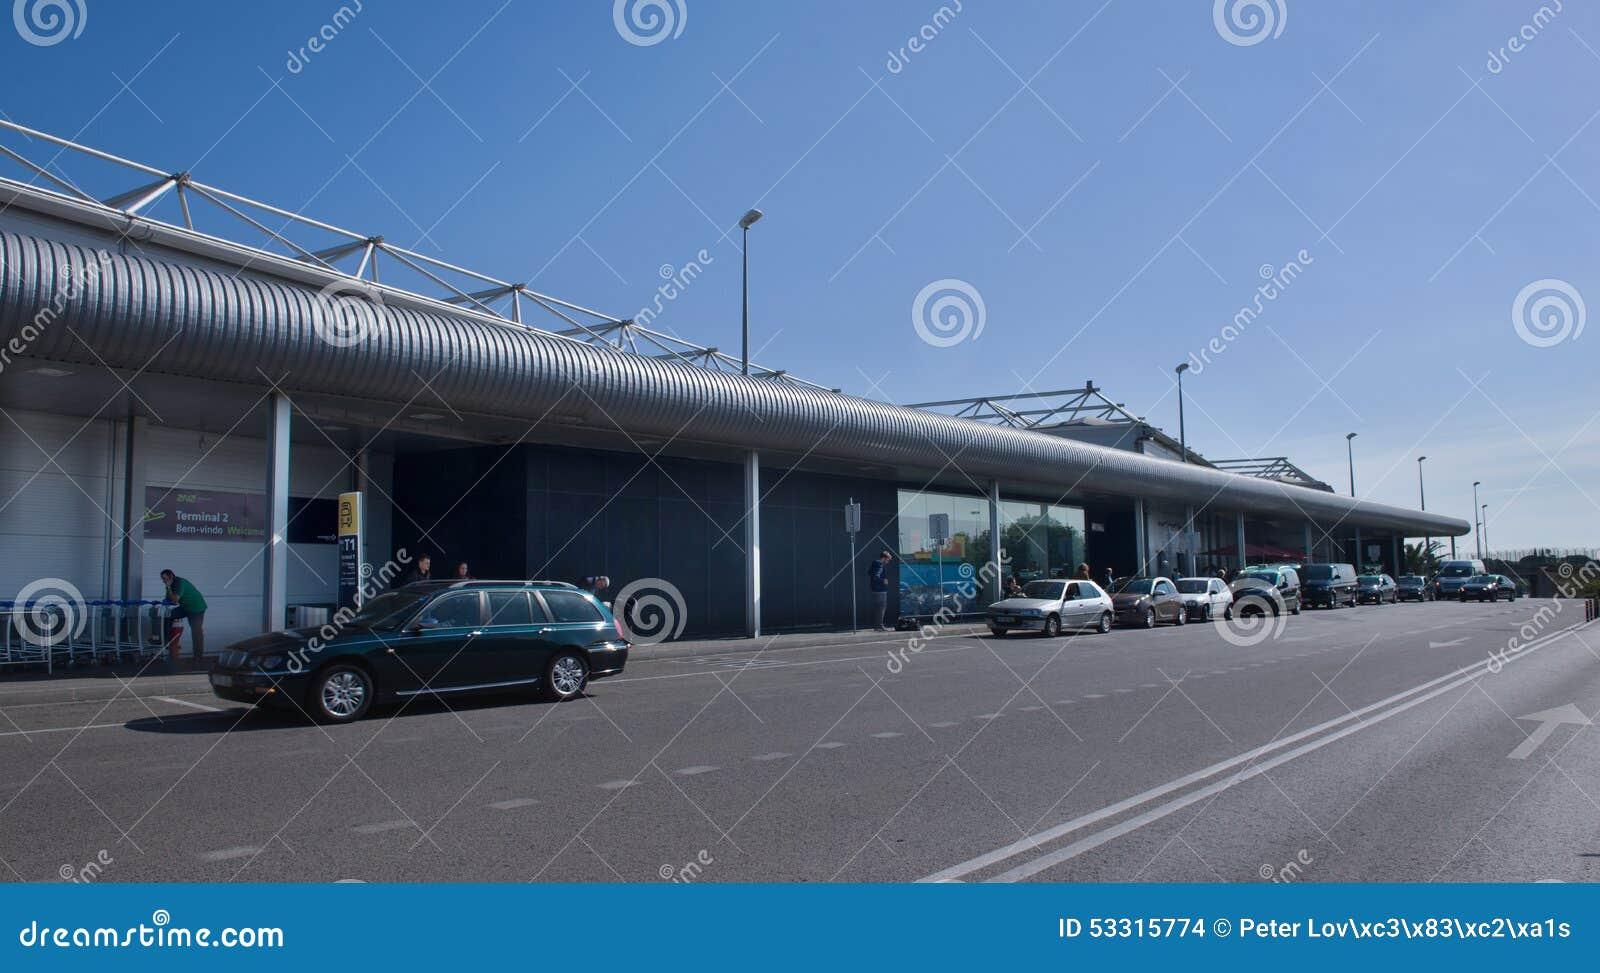 Aeroporto Lisbona : Aeroporto di lisbona terminale immagine stock